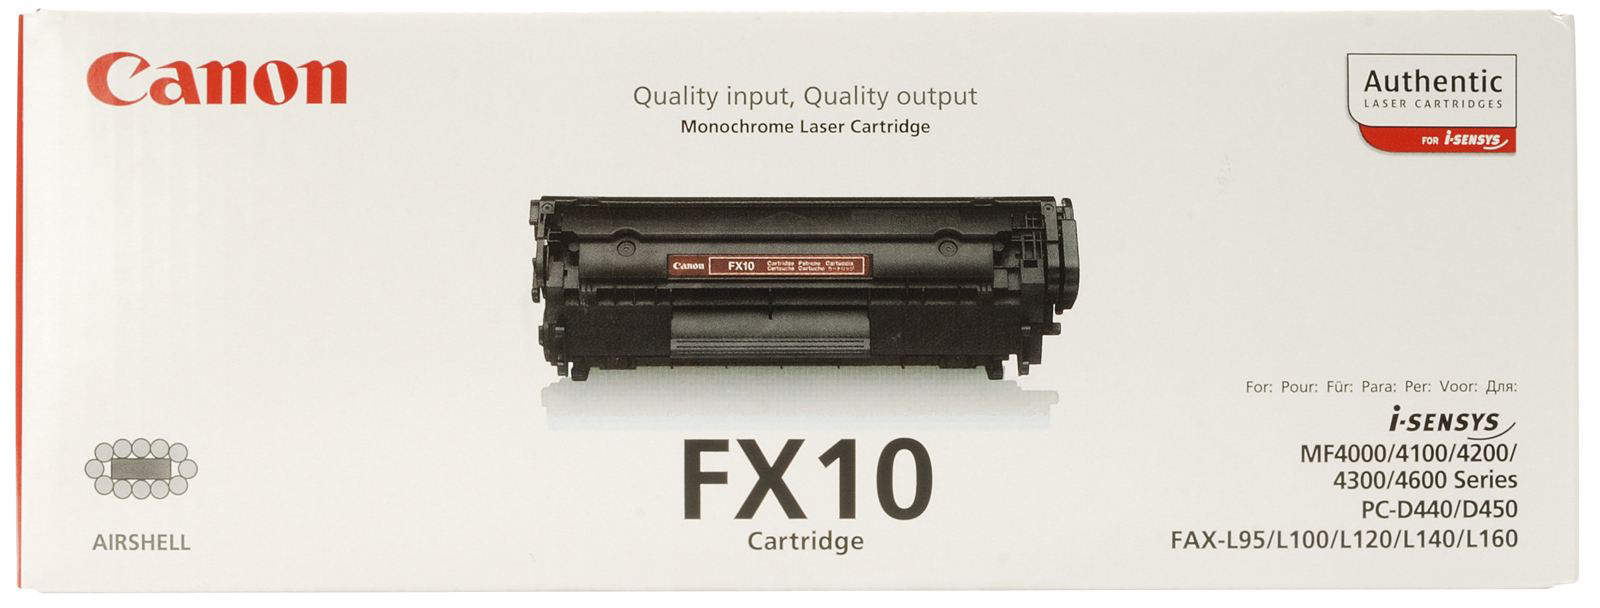 FX-10